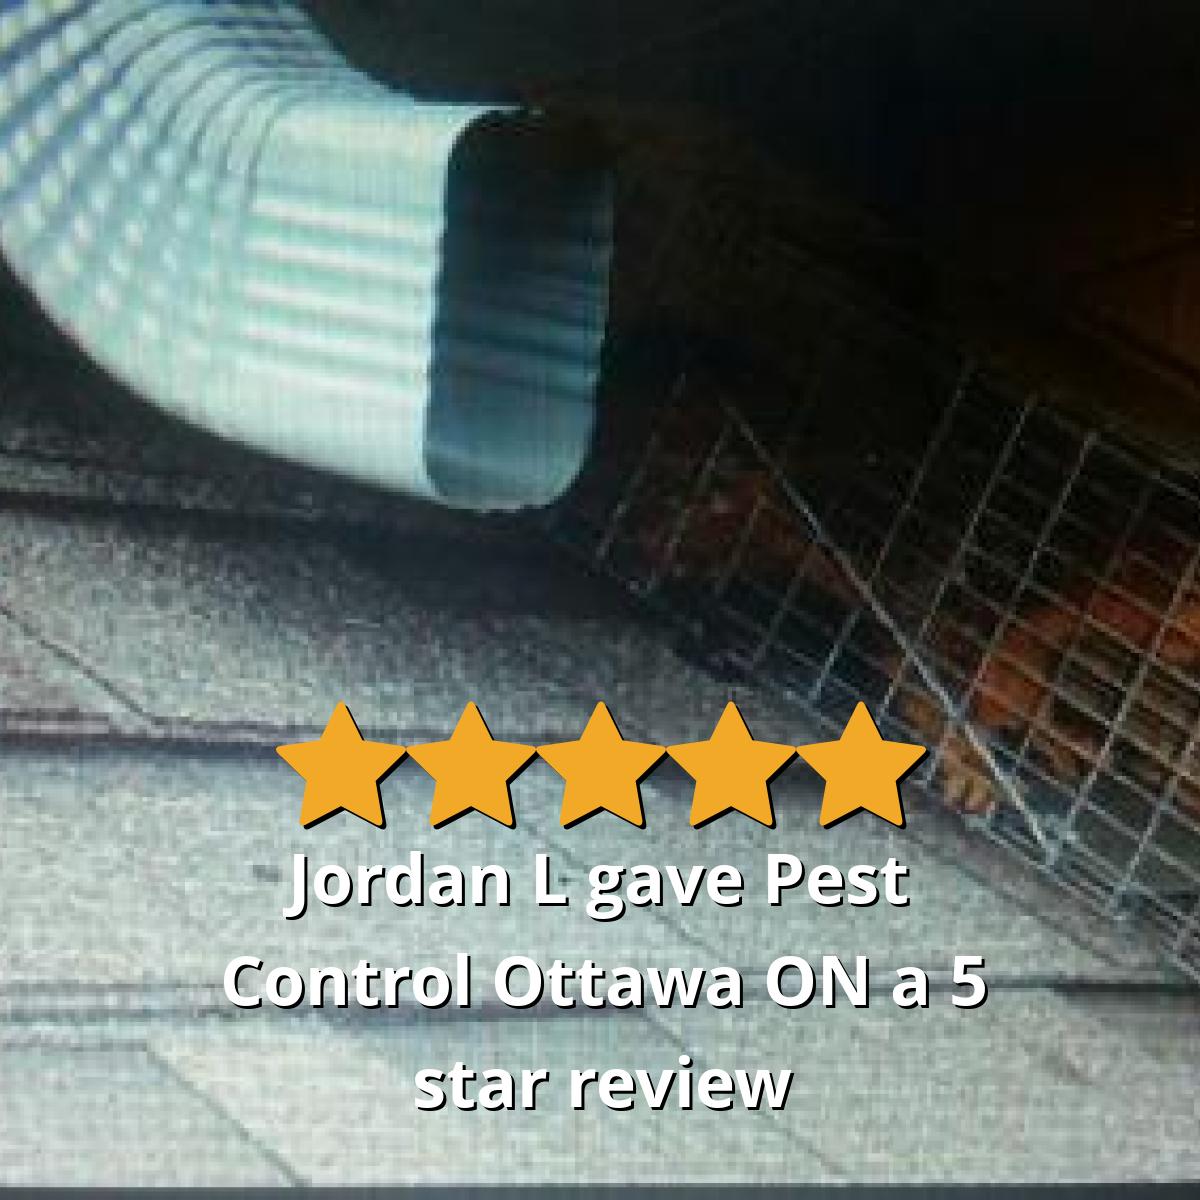 Jordan L gave Pest Control Ottawa ON a 5 star review